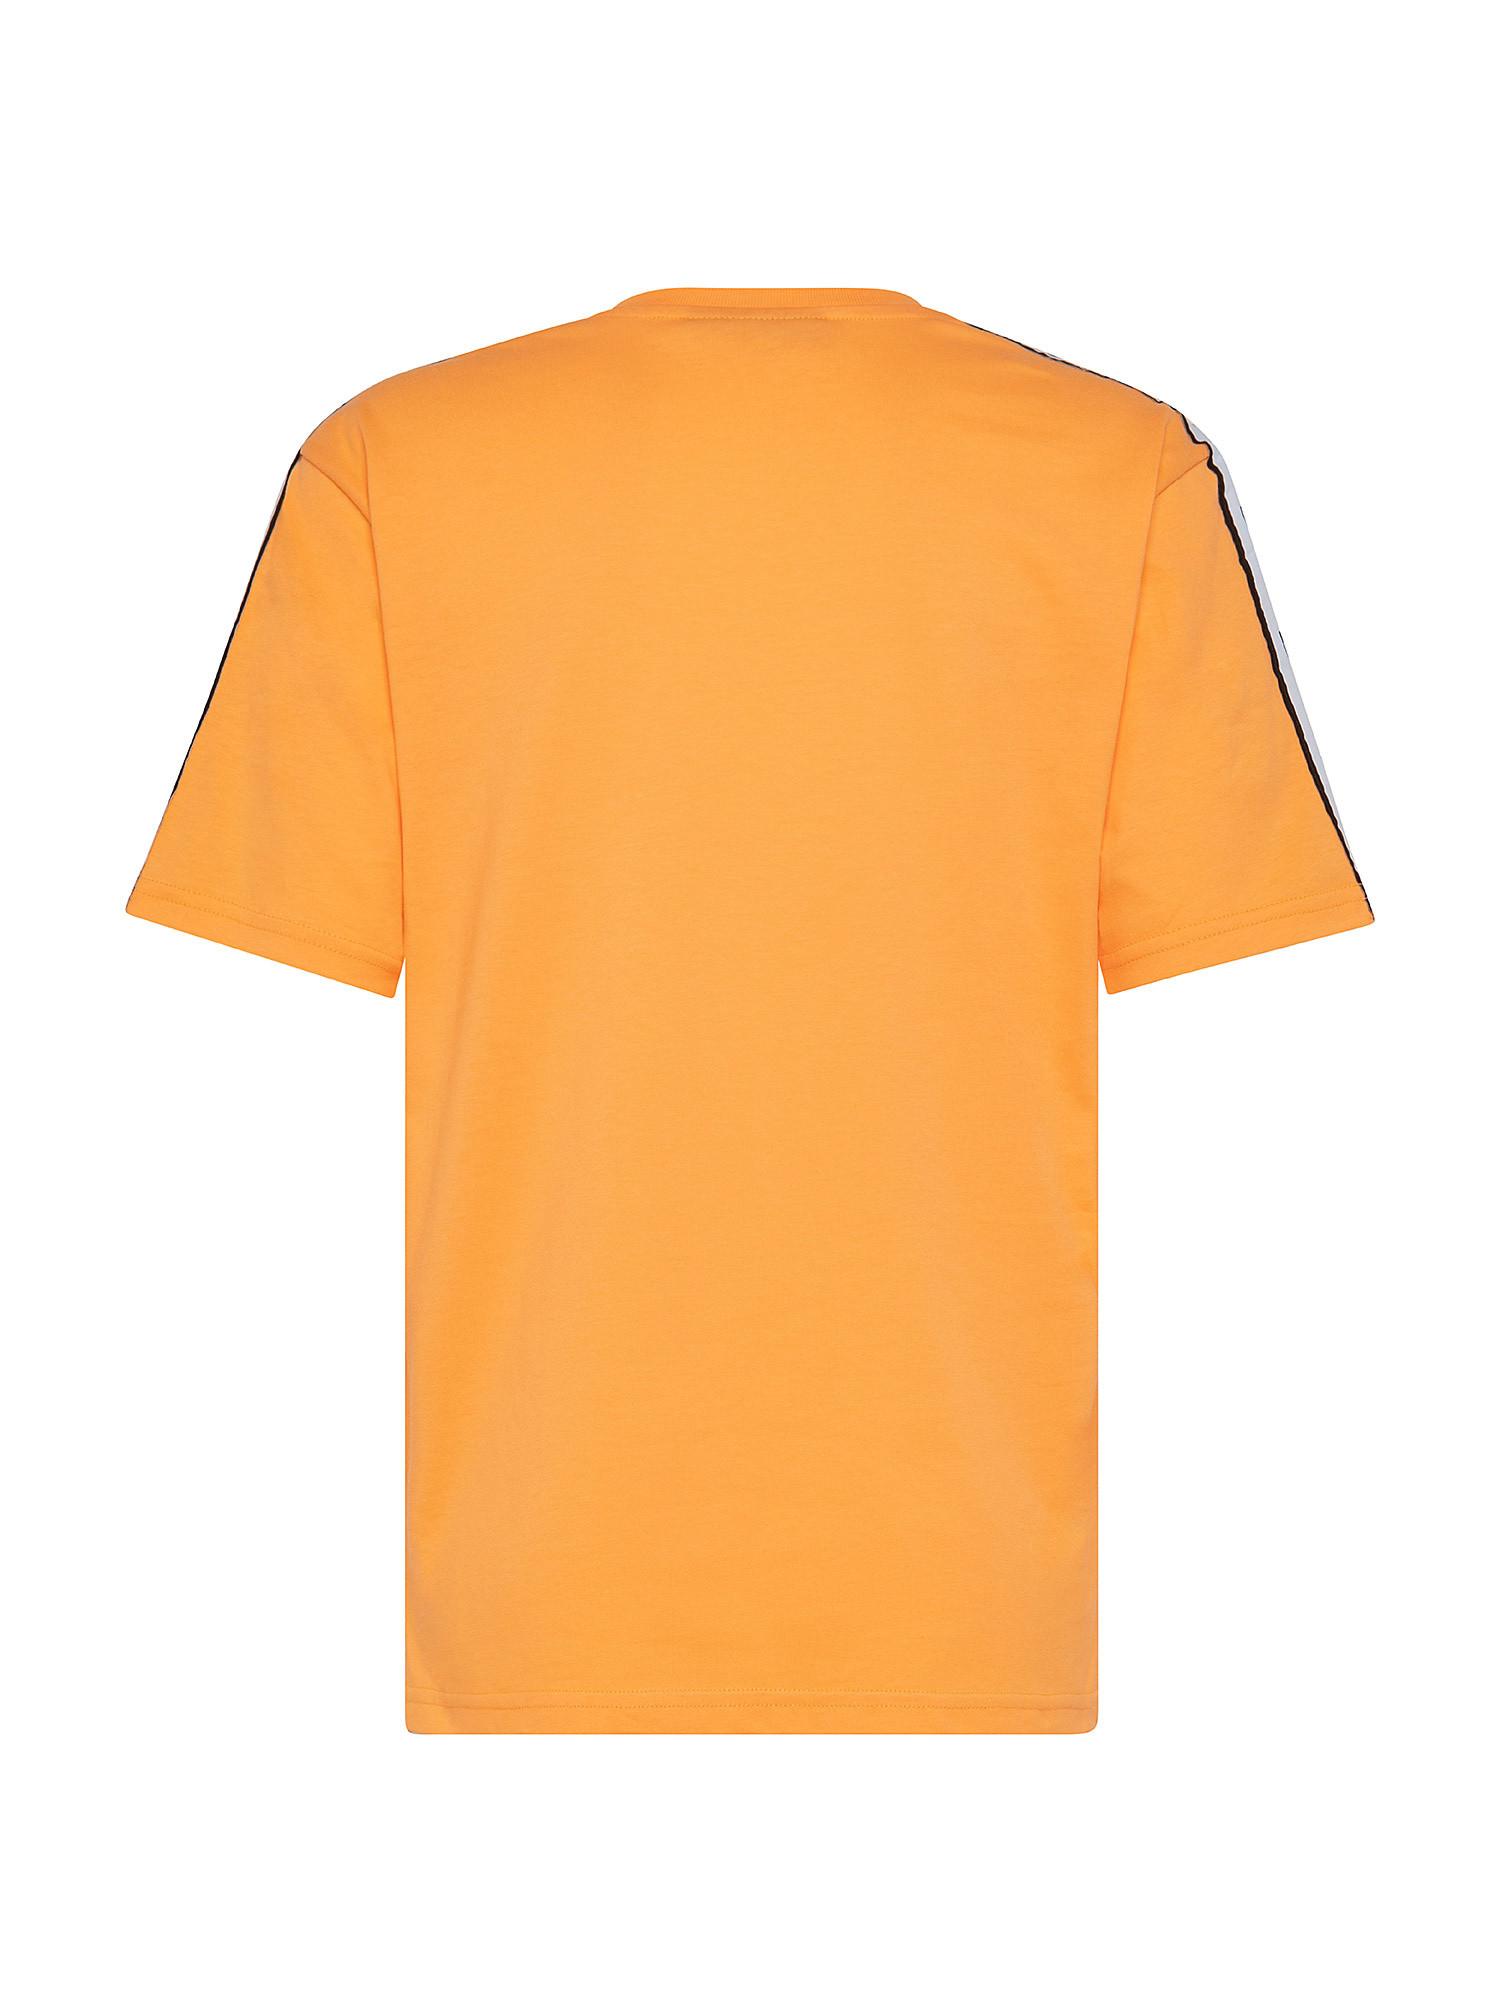 Logomania T-Shirt over, Arancione, large image number 1